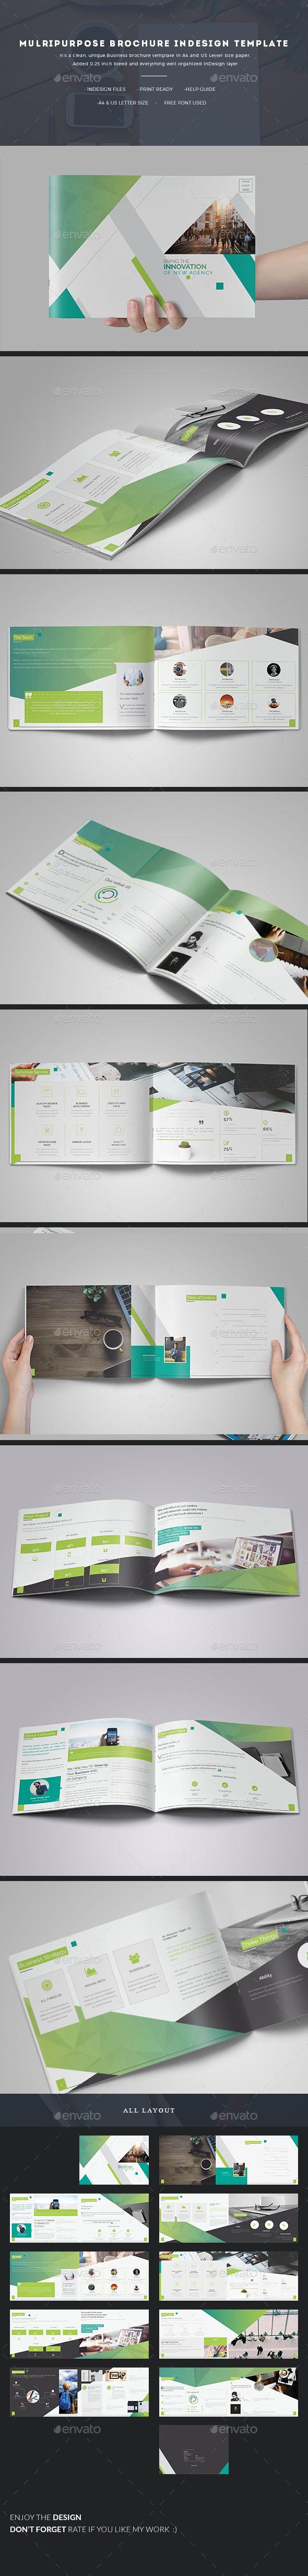 Multipurpose Brochure InDesign Template | Plantas